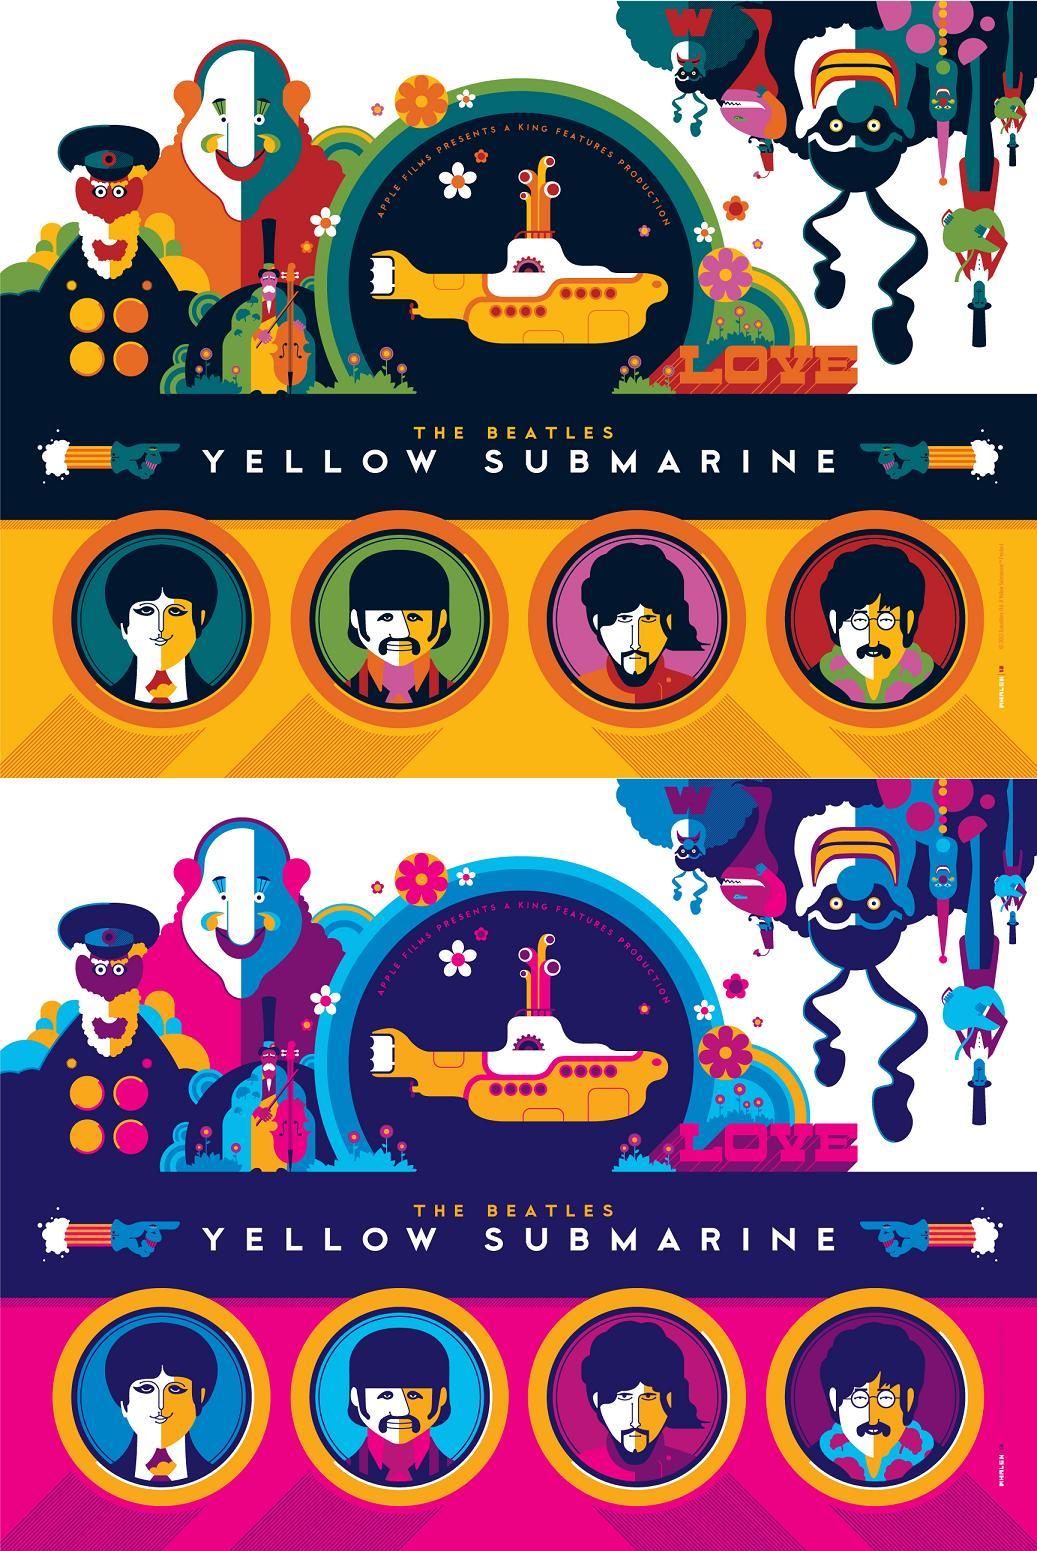 http://4.bp.blogspot.com/-fv2Ih1mvTxA/T6doPWzU1FI/AAAAAAAAPnE/jkNfuAxh0E8/s1600/The+Beatles+Yellow+Submarine+Print+Set+by+Tom+Whalen+-+Print+1+Standard+and+Pink+Variant+Editions.jpg